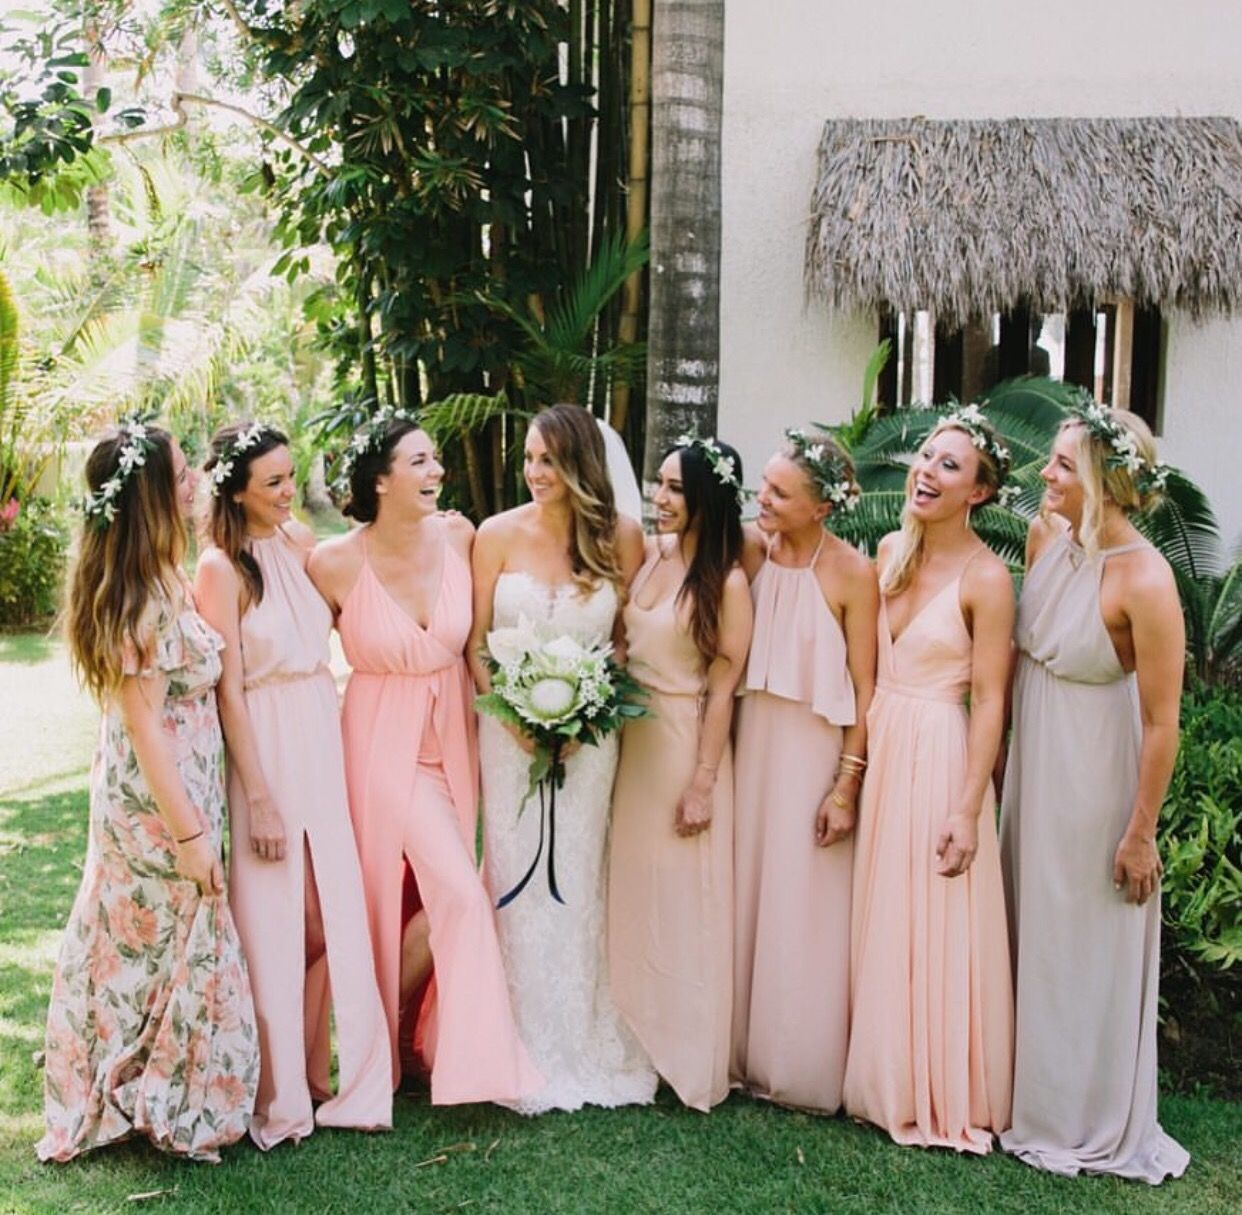 Boho beach bridesmaids via gws mumu weddings dream wedding